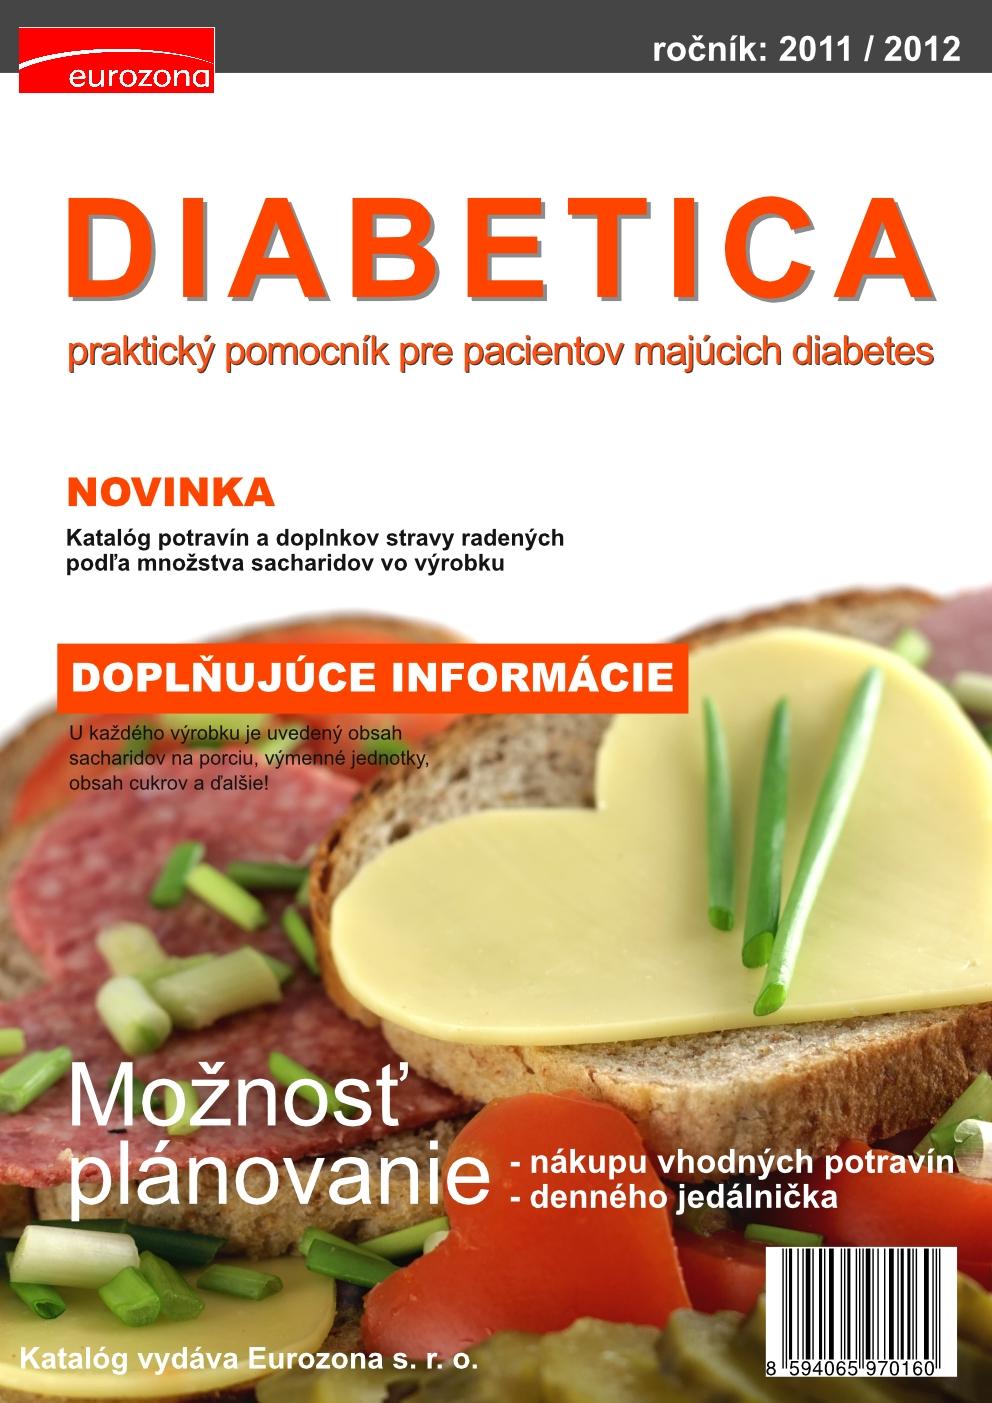 DIABETICA SK